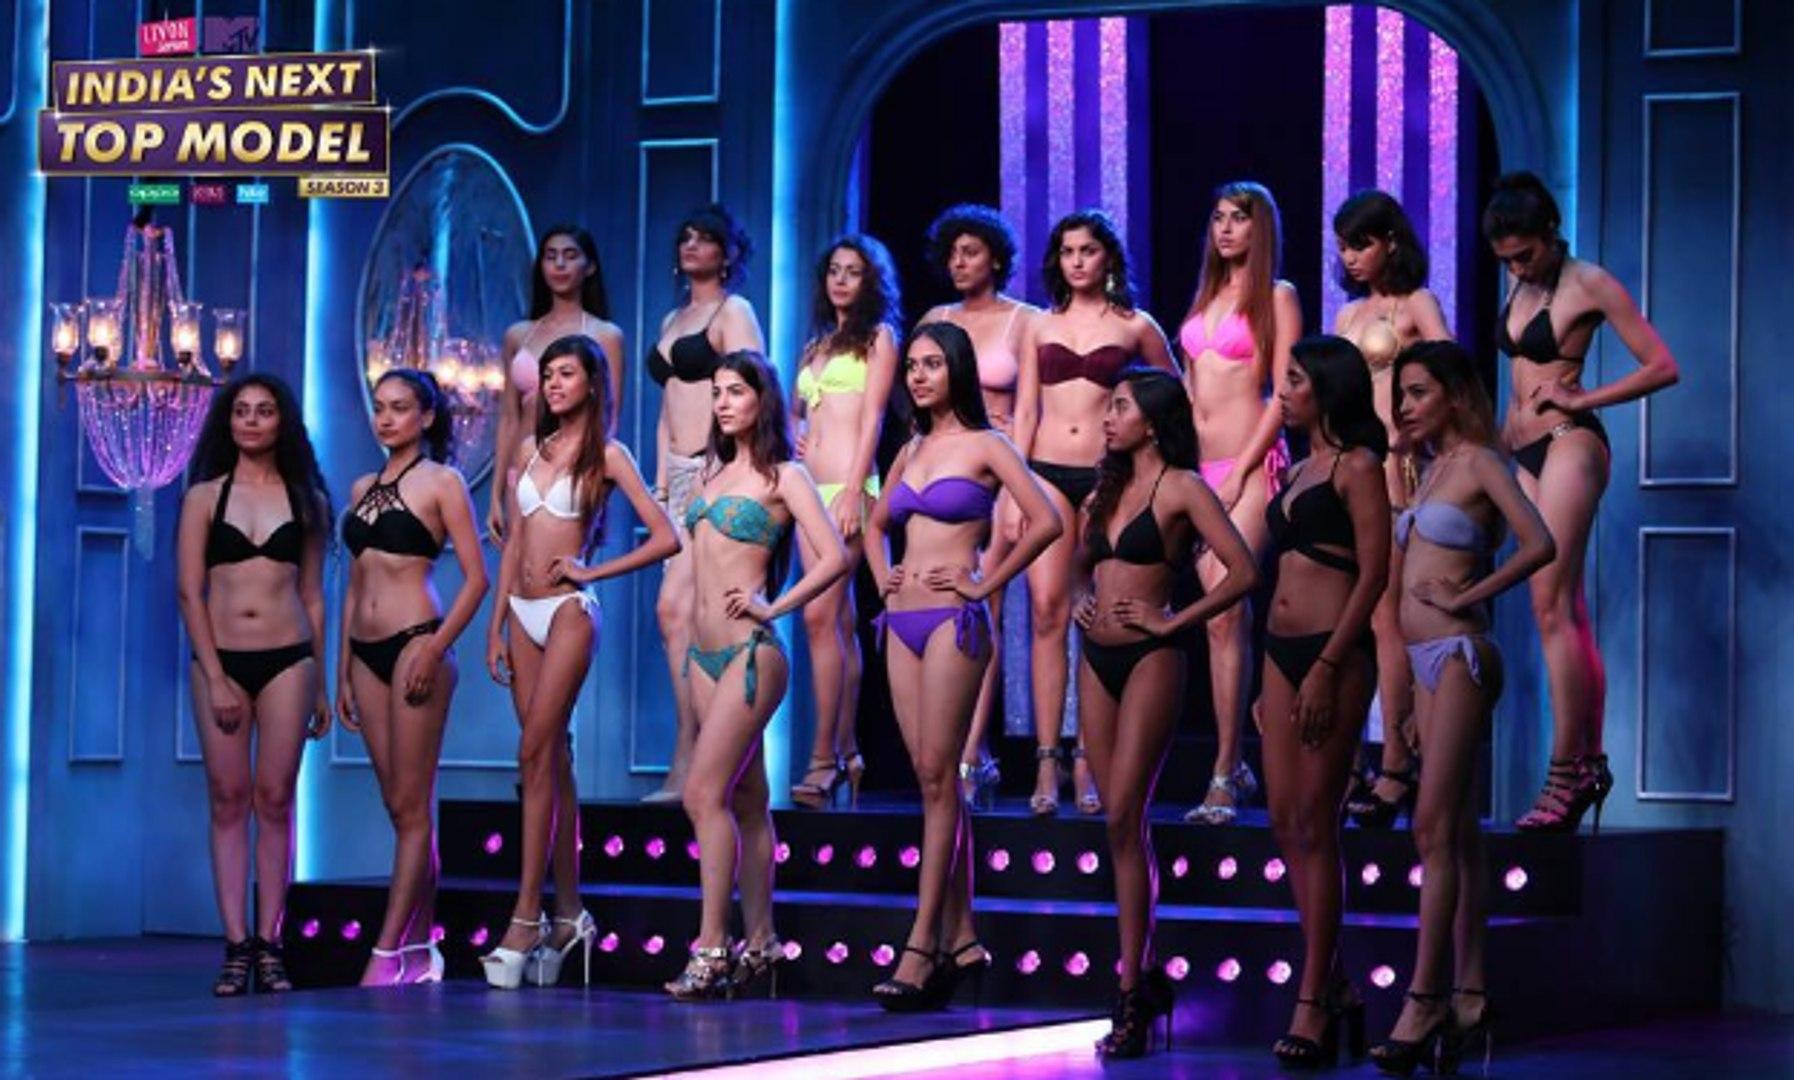 India's Next Top Model Season 5 Episode 1 : Episode 1 FULL SHOW